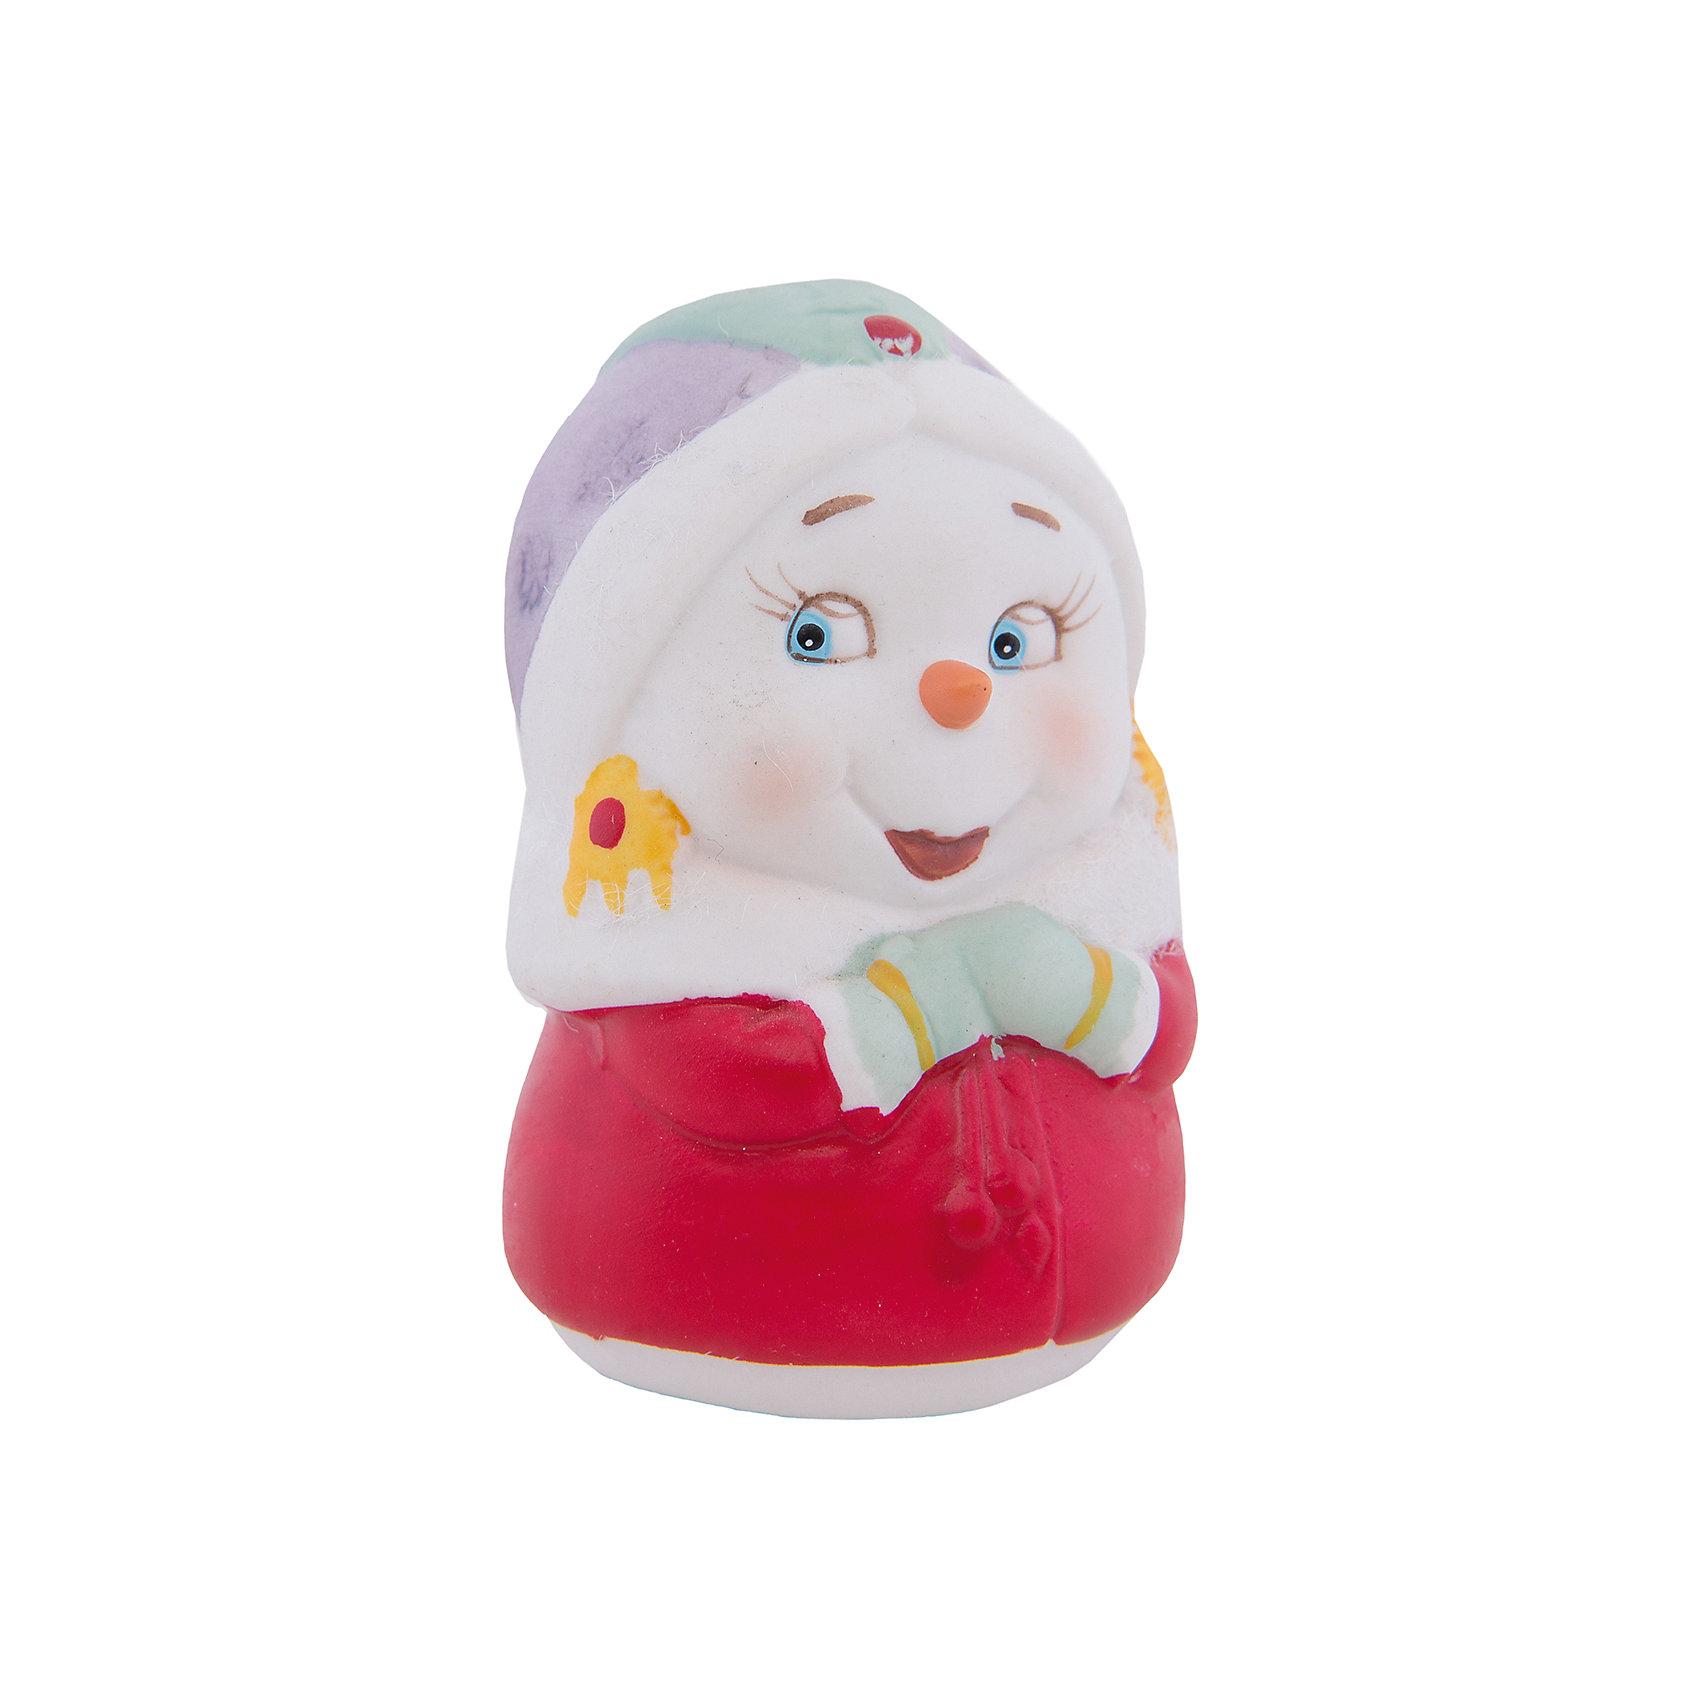 Феникс-Презент Новогодняя фигурка снеговика Снеговик-девушка колесная газонокосилка champion lm 4622